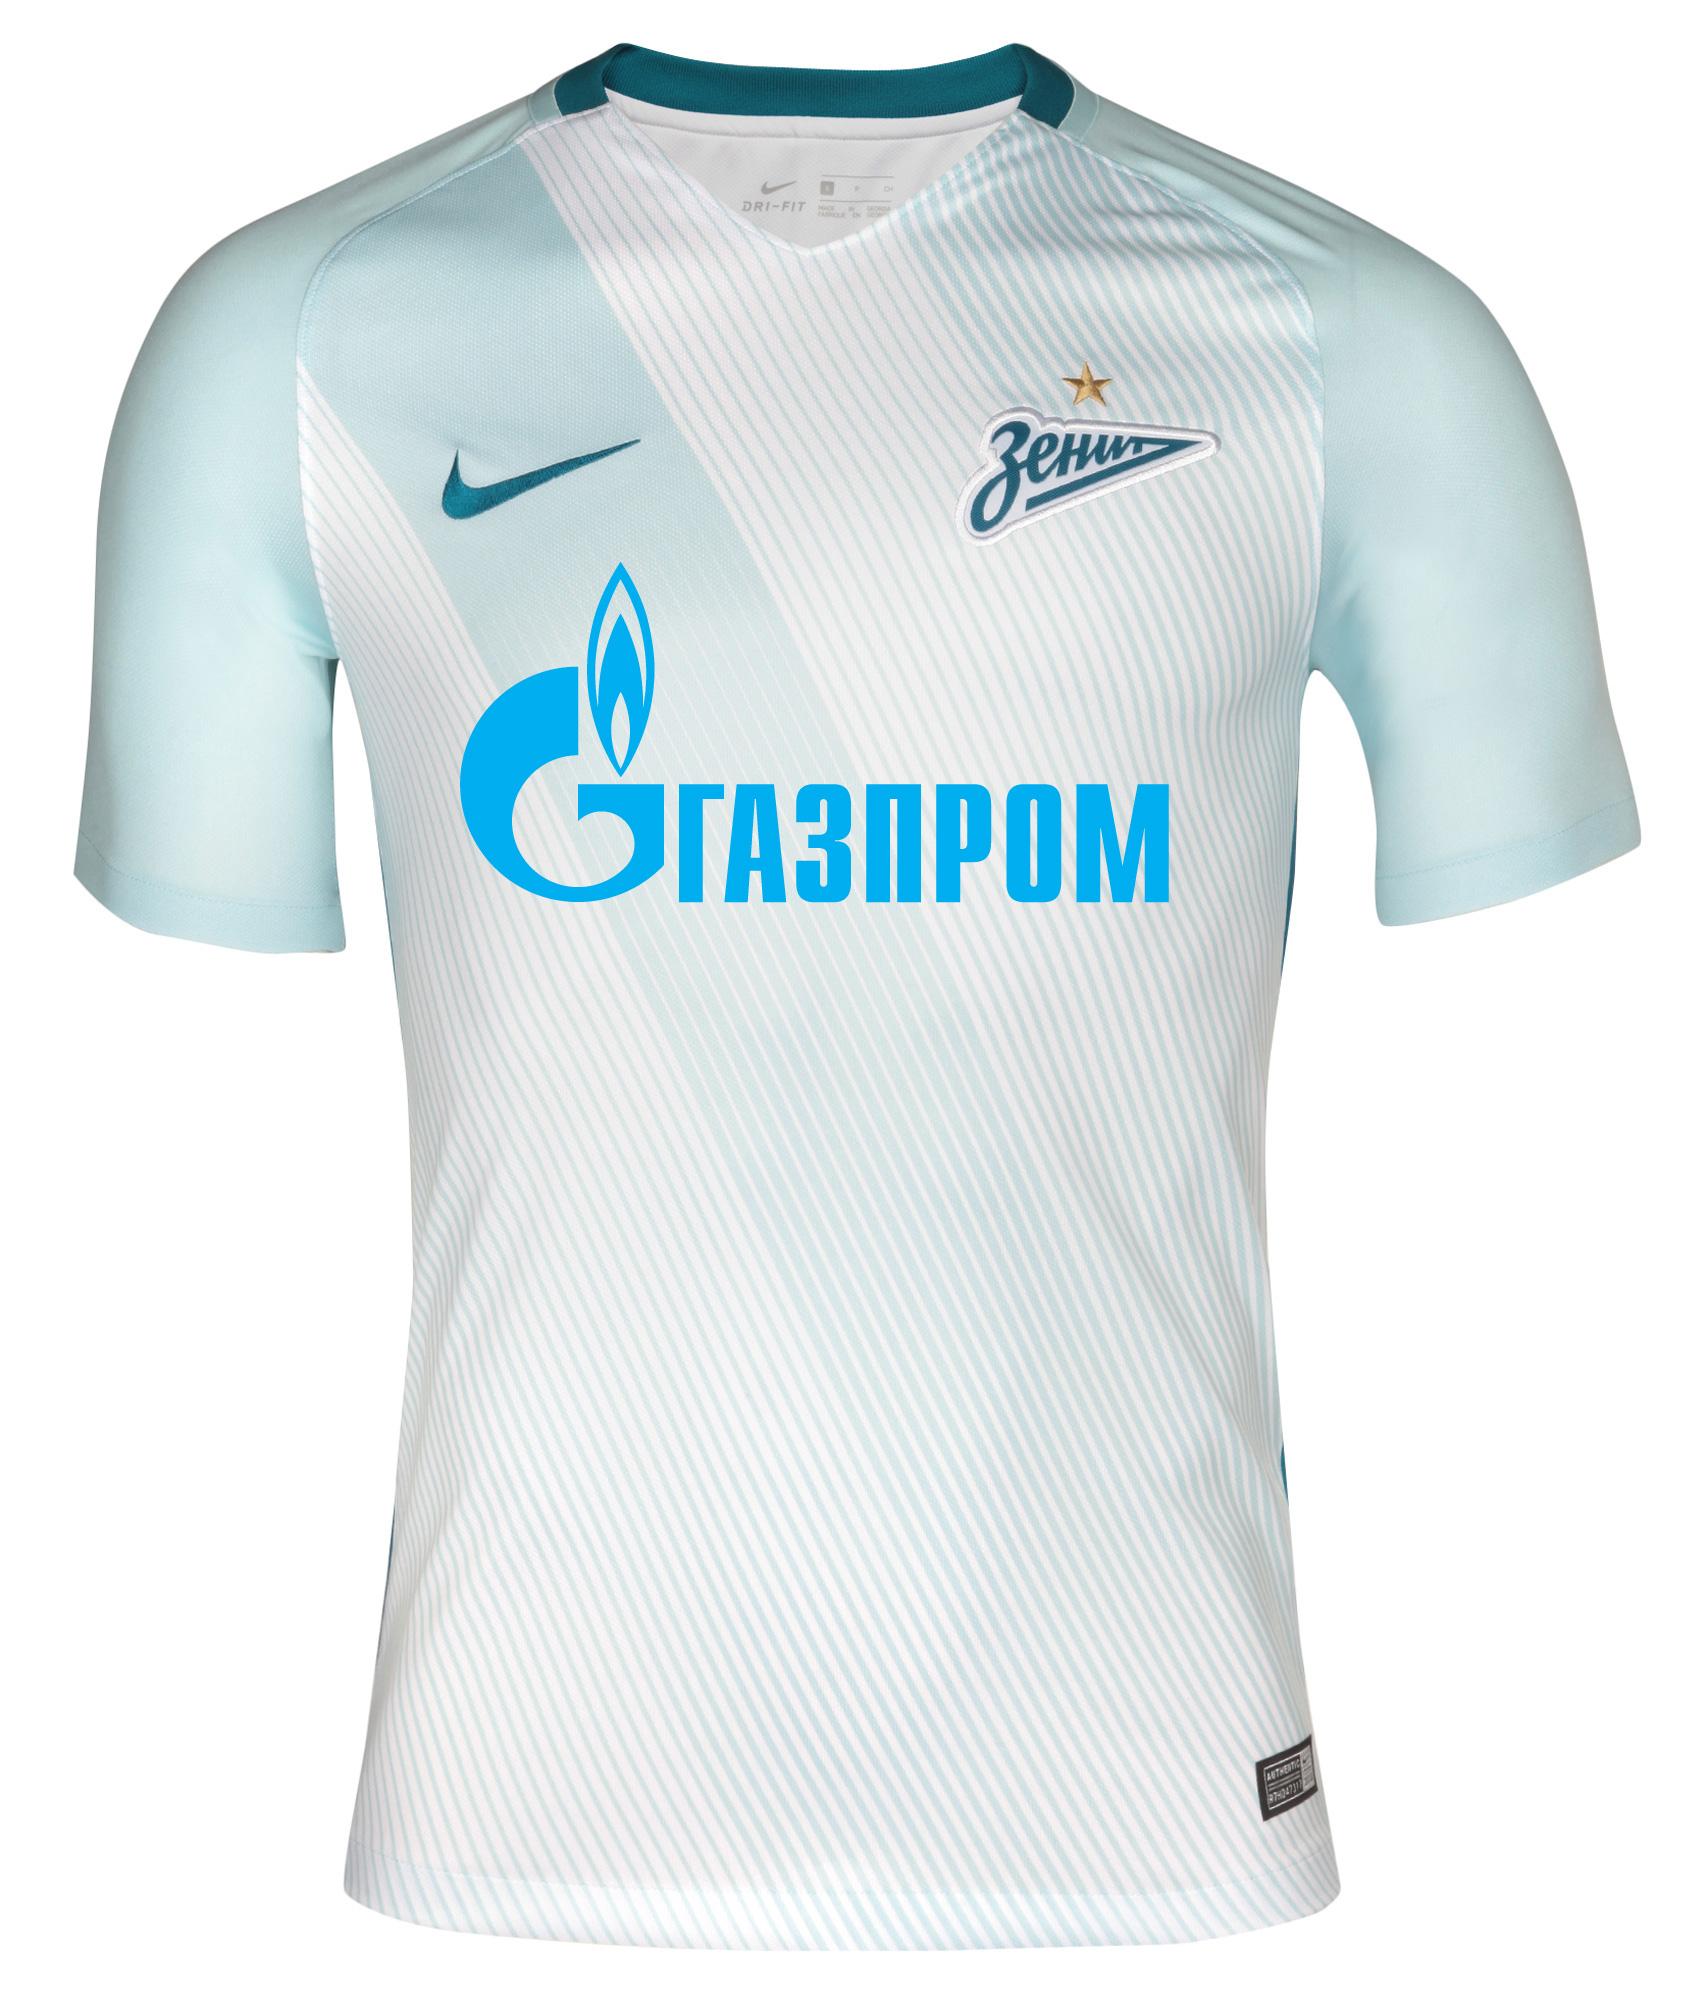 Игровая выездная футболка Nike Цвет-Белый футболка quiksilver skybreakcrew real teal heather